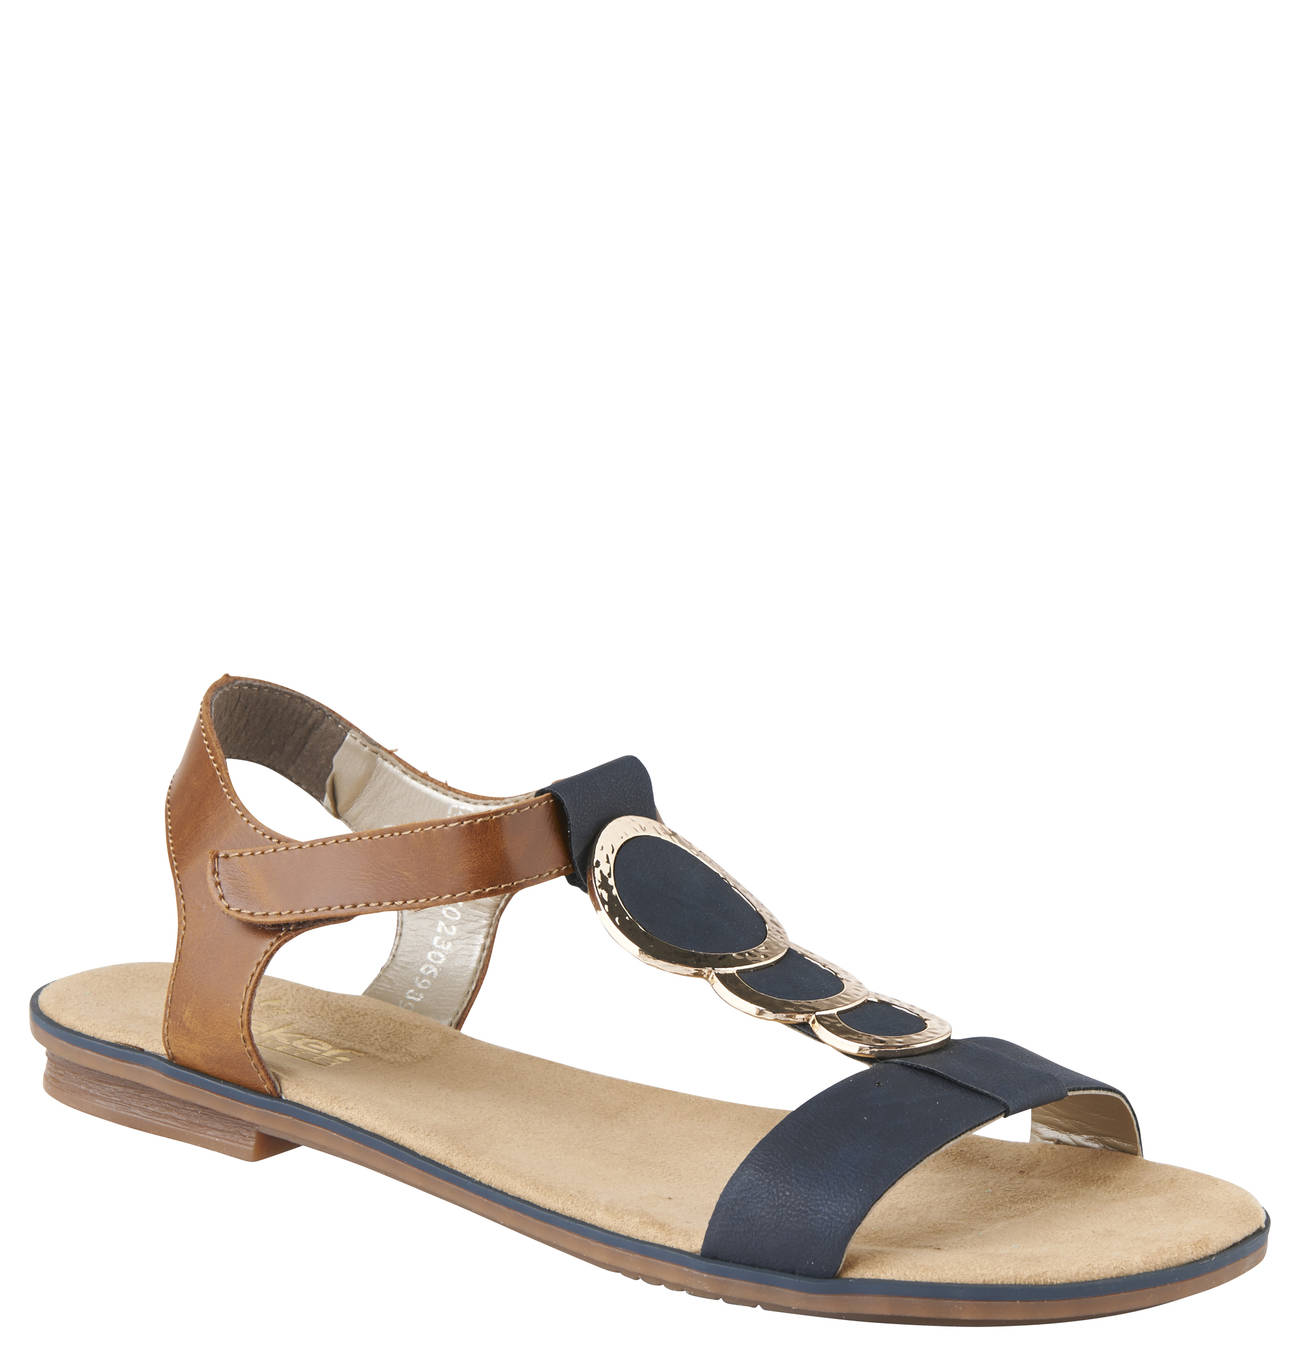 Sandalen, Metallringe, Klettverschluss | Rieker sandalen